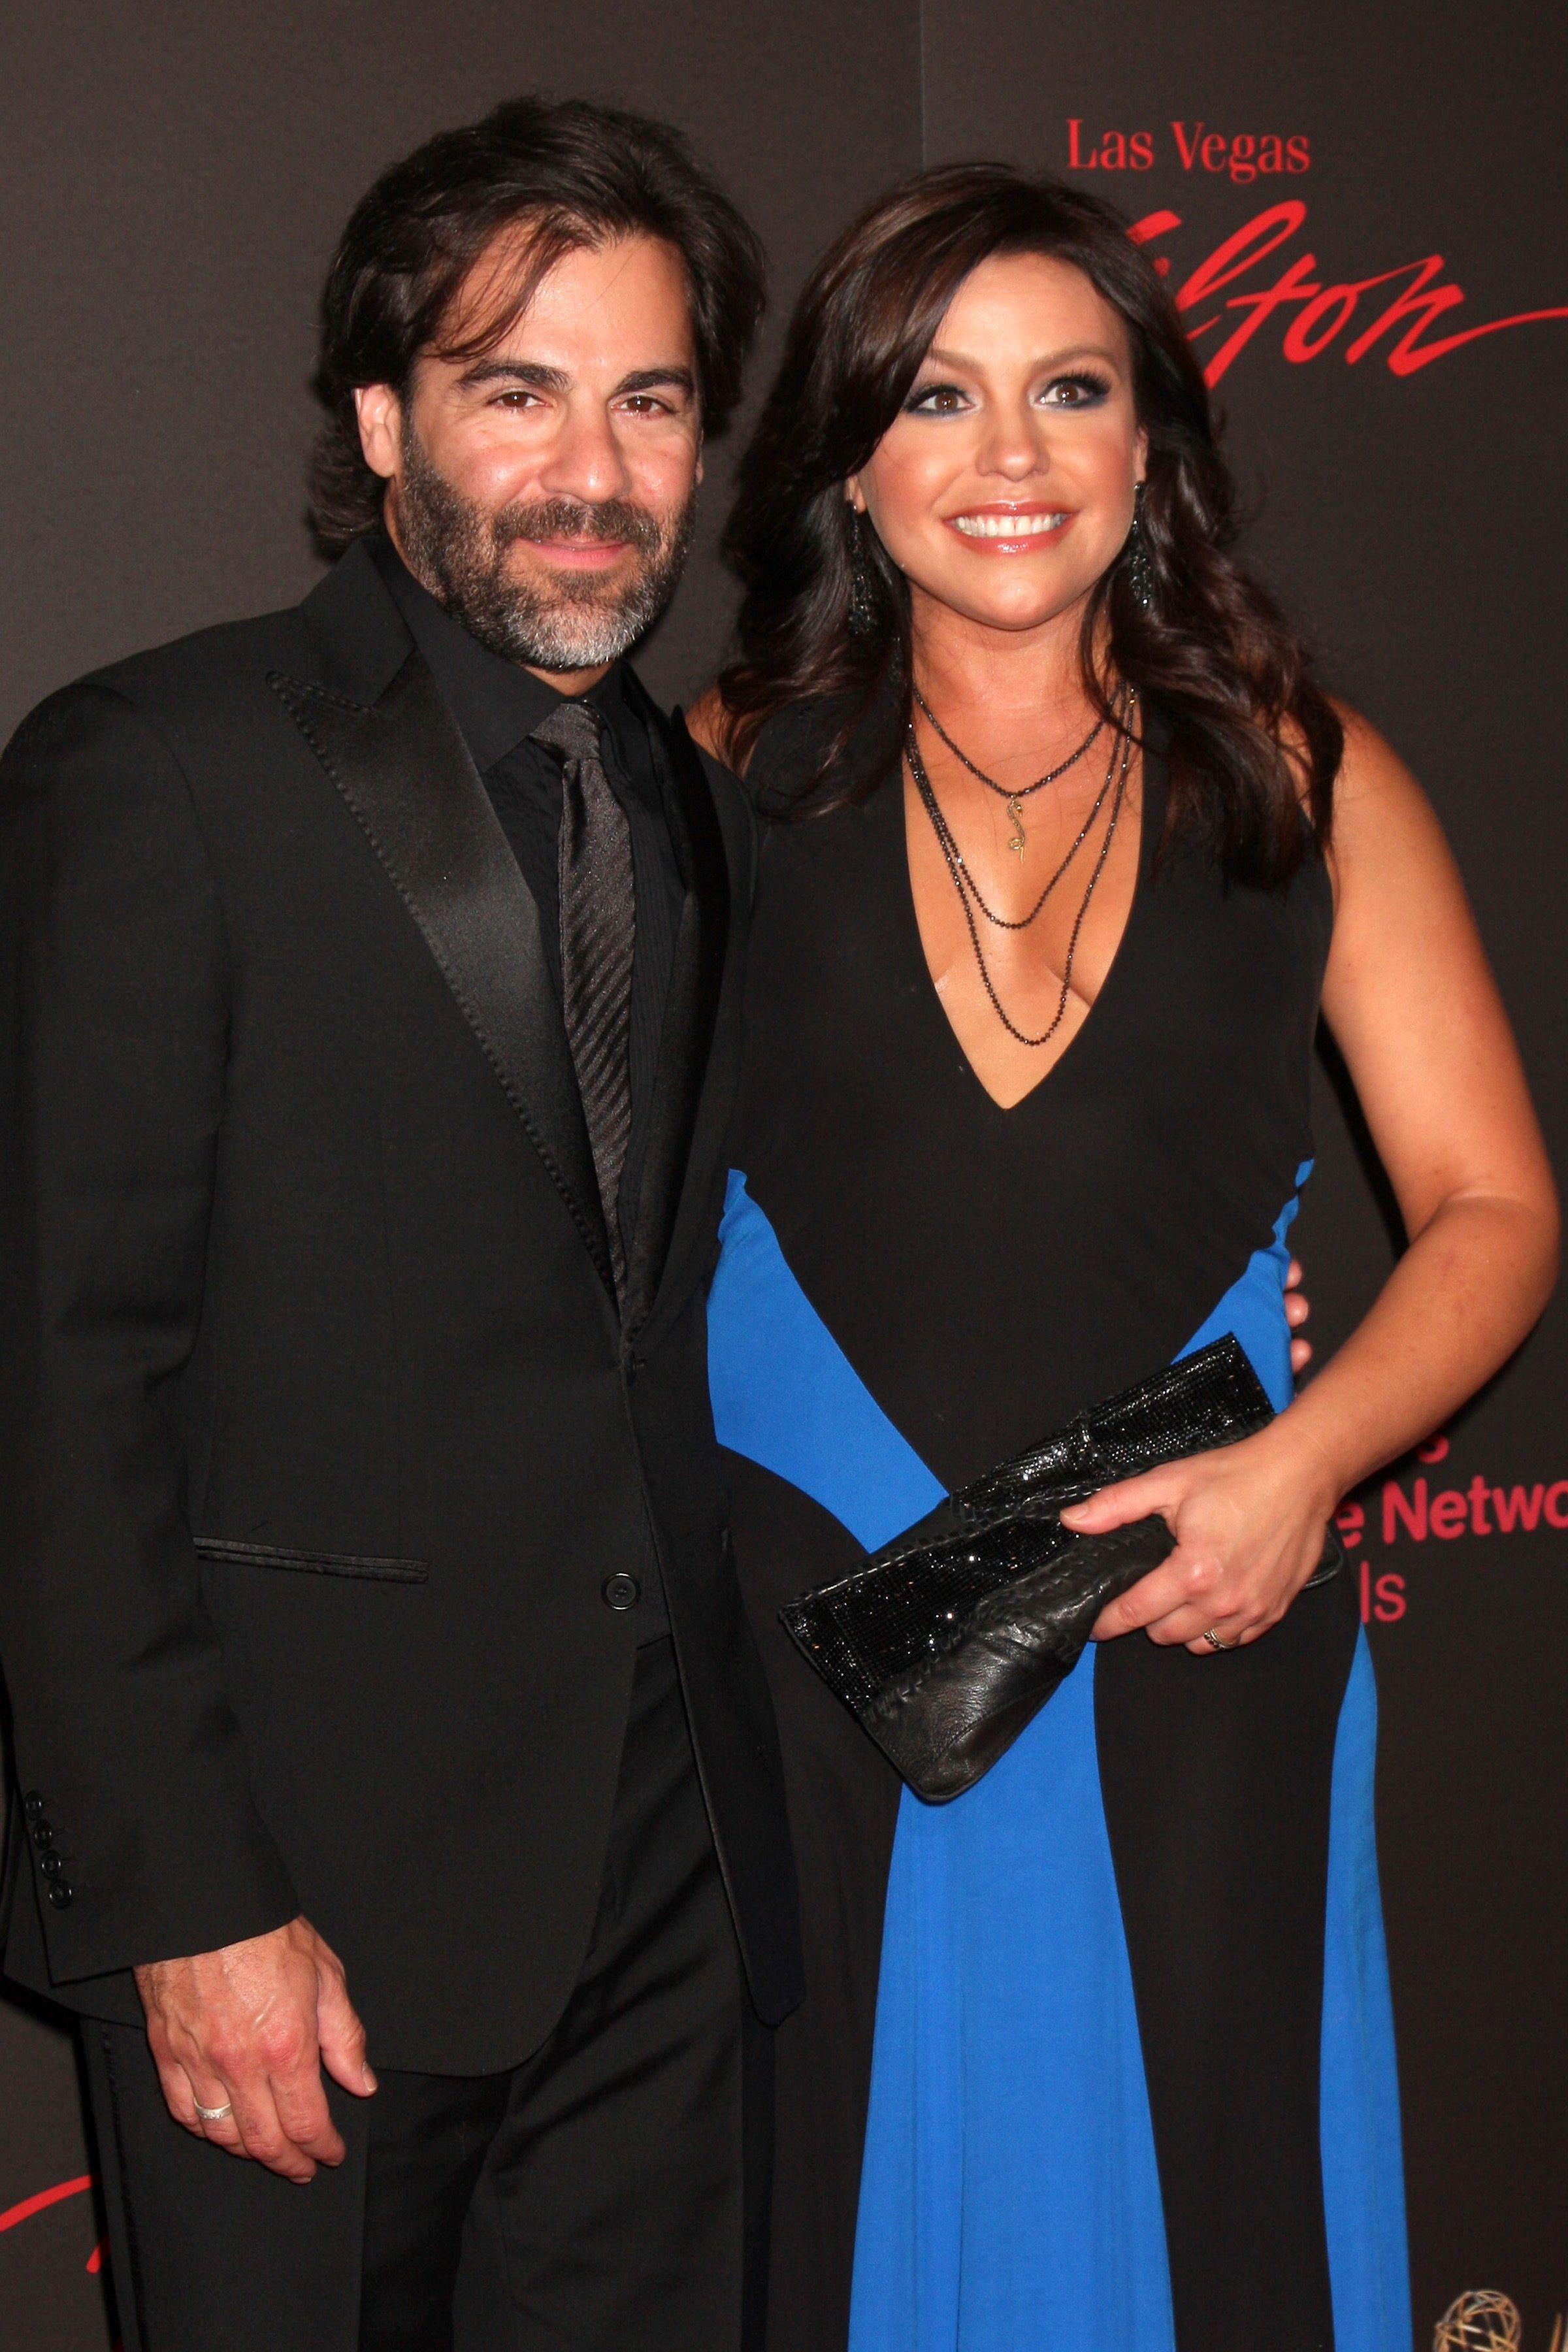 10. Rachael Ray & John Cusimano